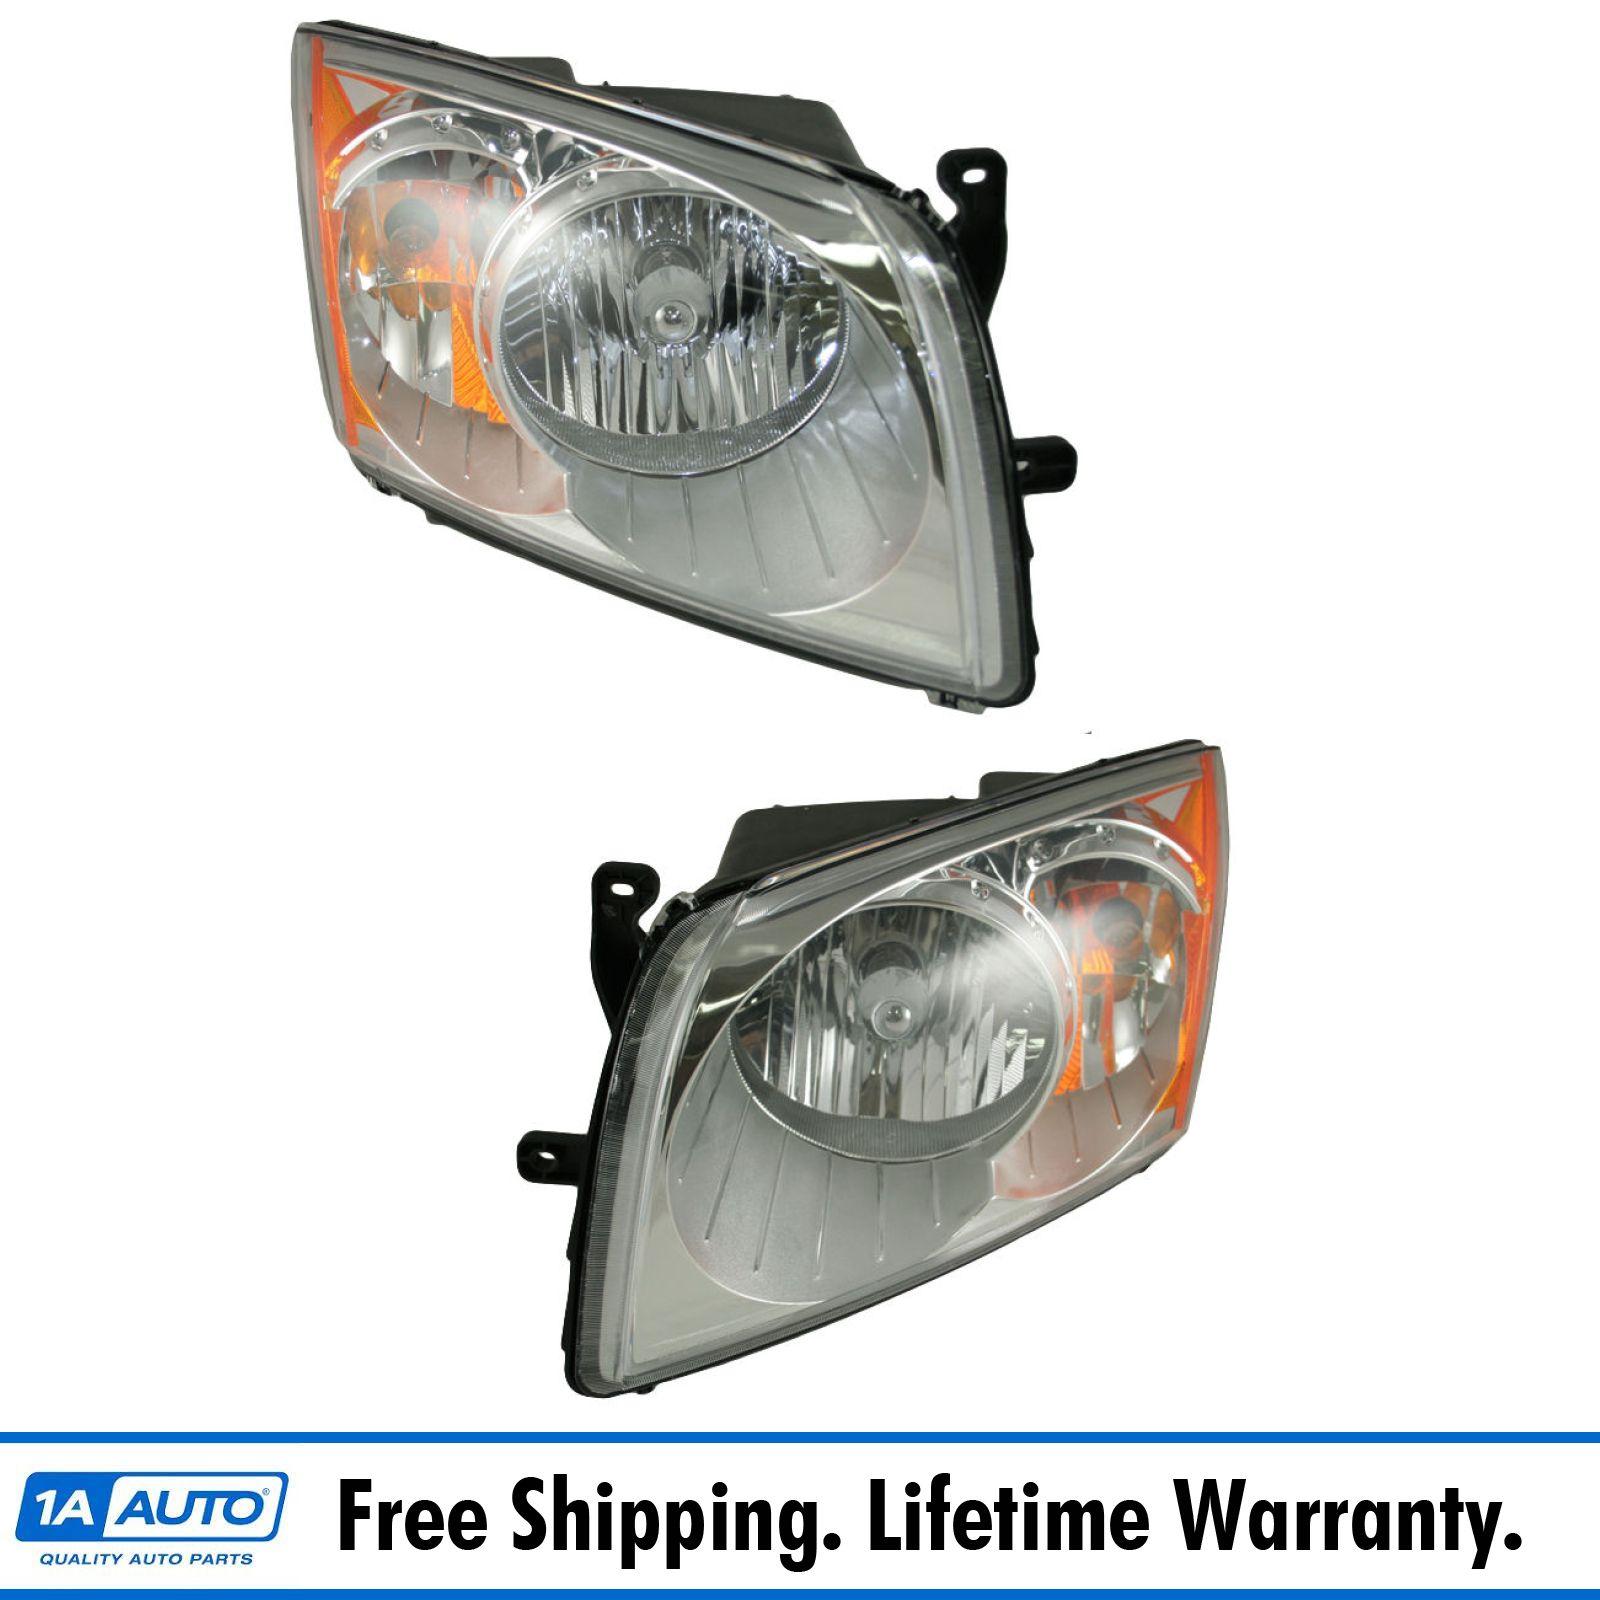 93-99 VW Jetta Headlight Headlamp Front Head Light Lamp Right Passenger Side DOT